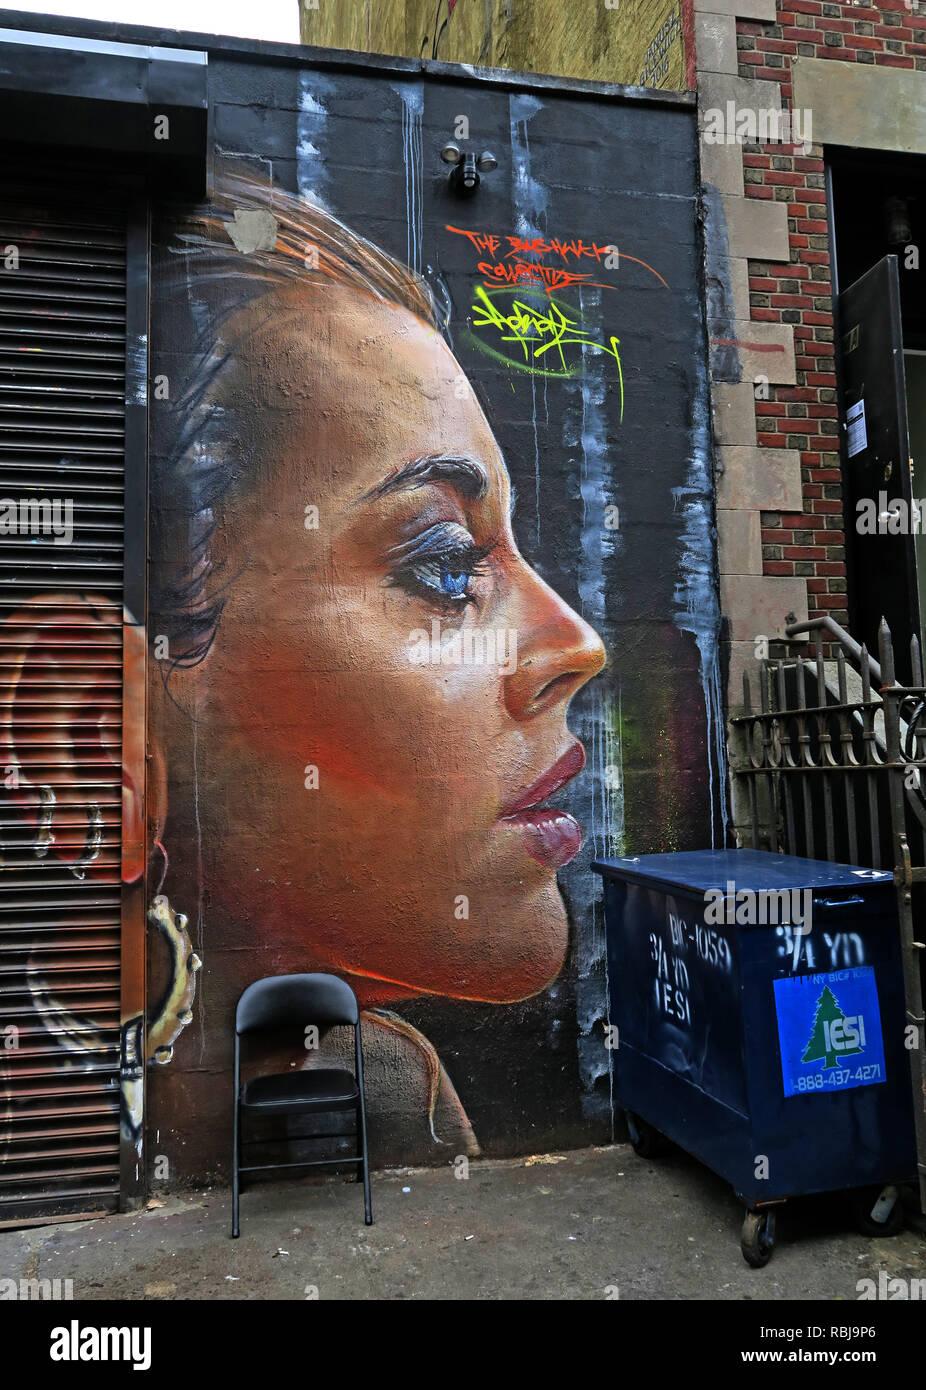 @HotpixUK,HotpixUK,GoTonySmith,NY,NYC,New York City,City,Centre,City Centre,street,USA,United states of America,United States,St Marks Place,Art,Saint Marks Place,art,Manhattan,East Village,New York